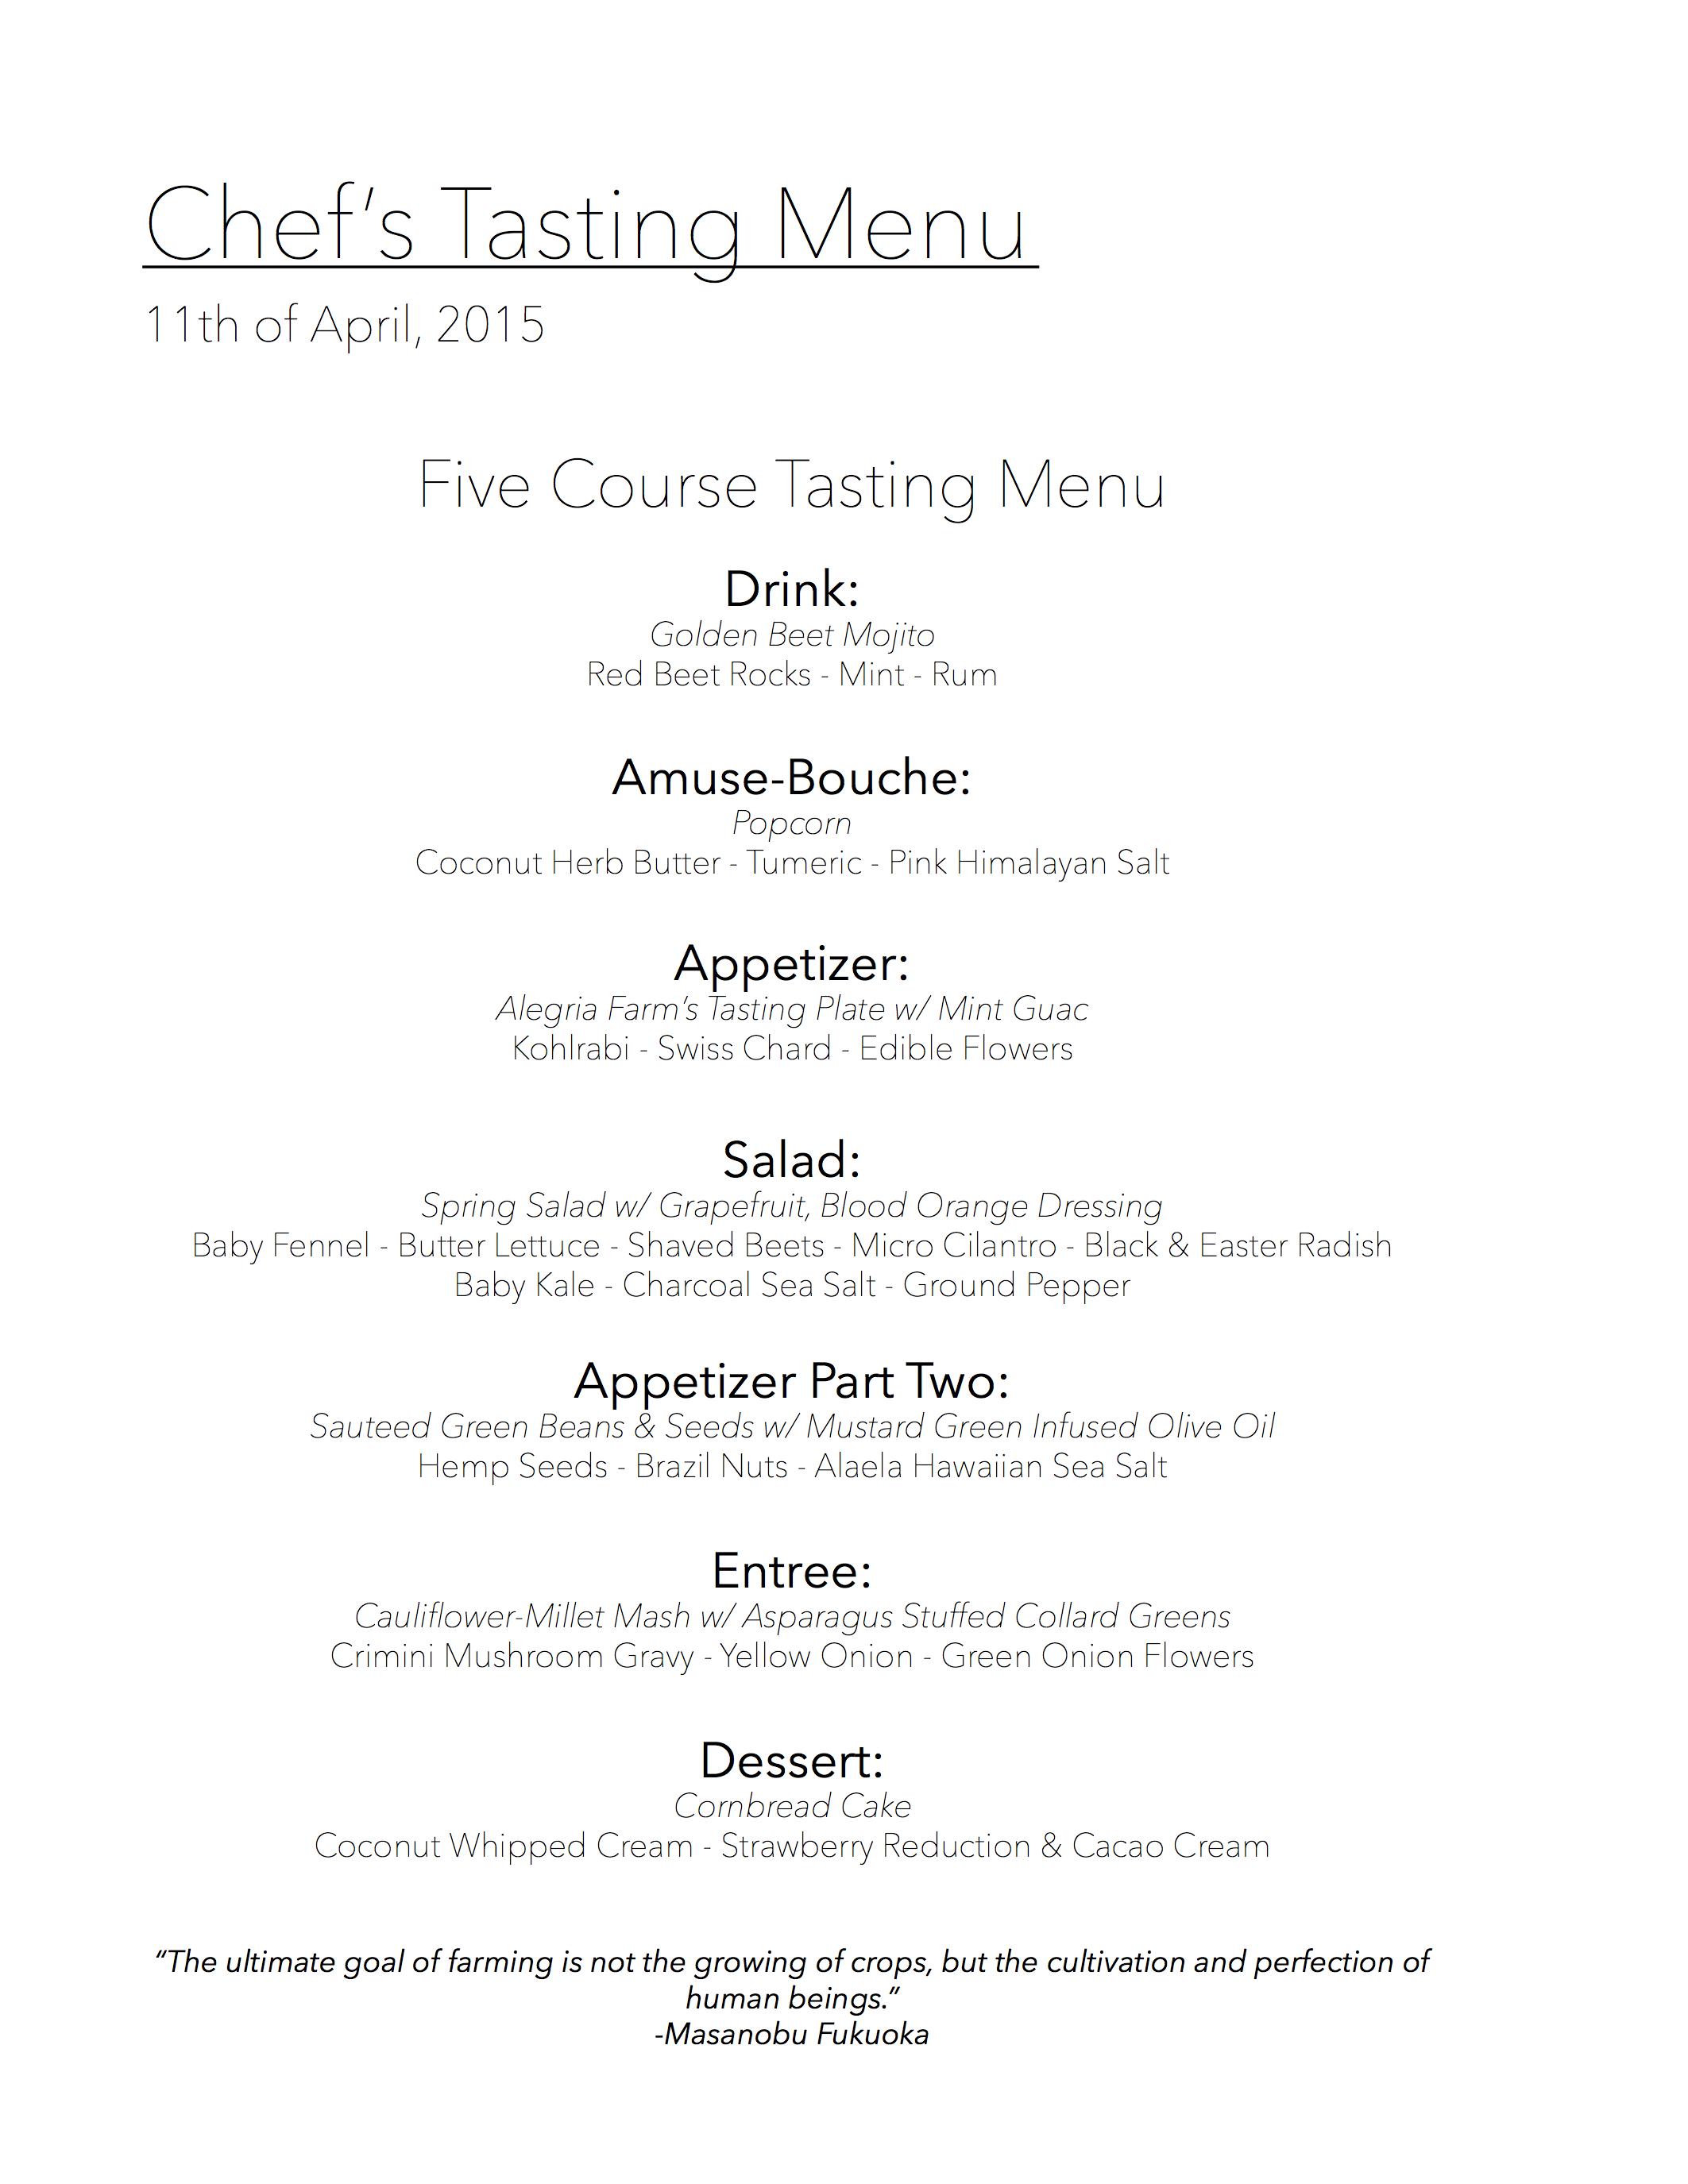 Chef's Tasting Menu - 4.11.15.jpg